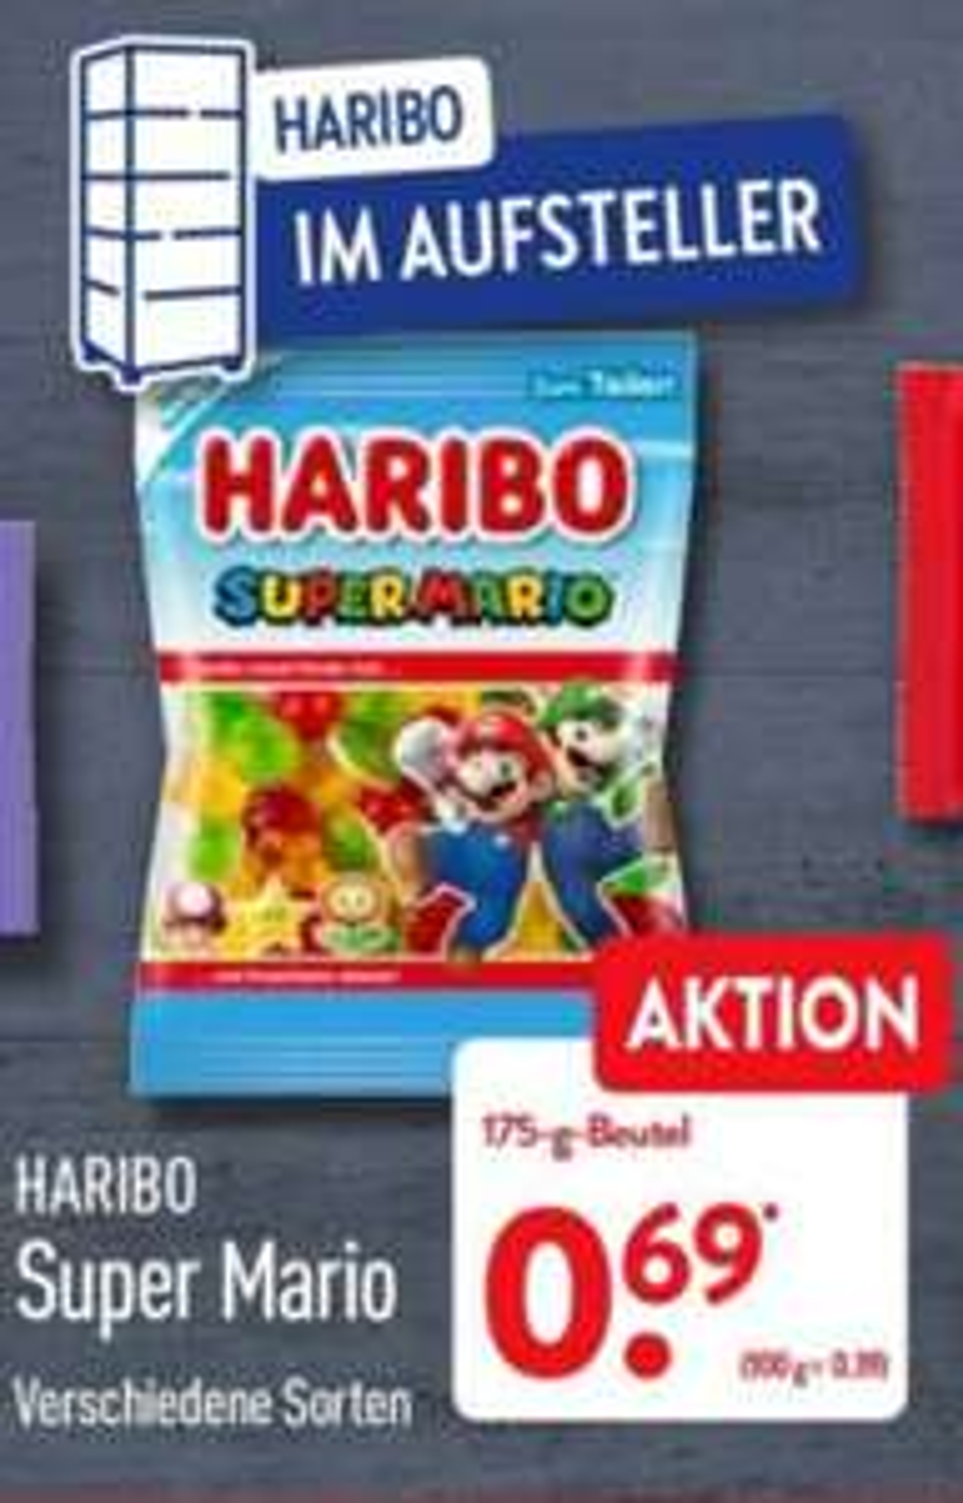 Haribo Super Mario 175 g Beutel verschiedene Sorten ab Freitag 09.07 Aldi Nord